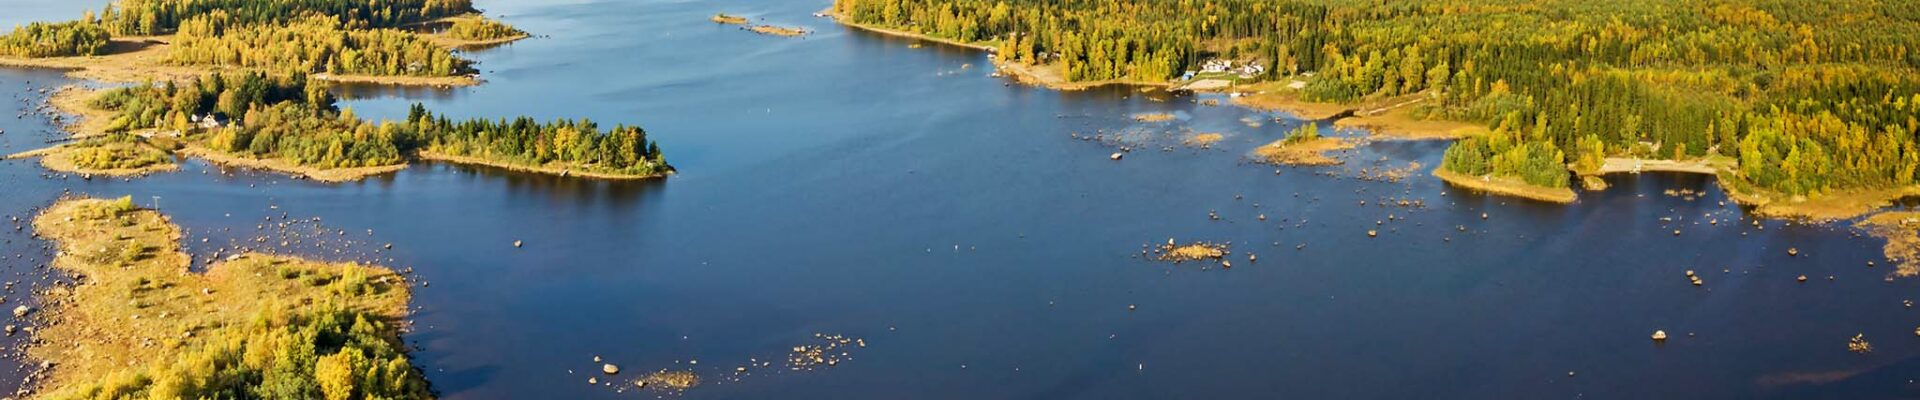 Koe Kalajoki syksyllä